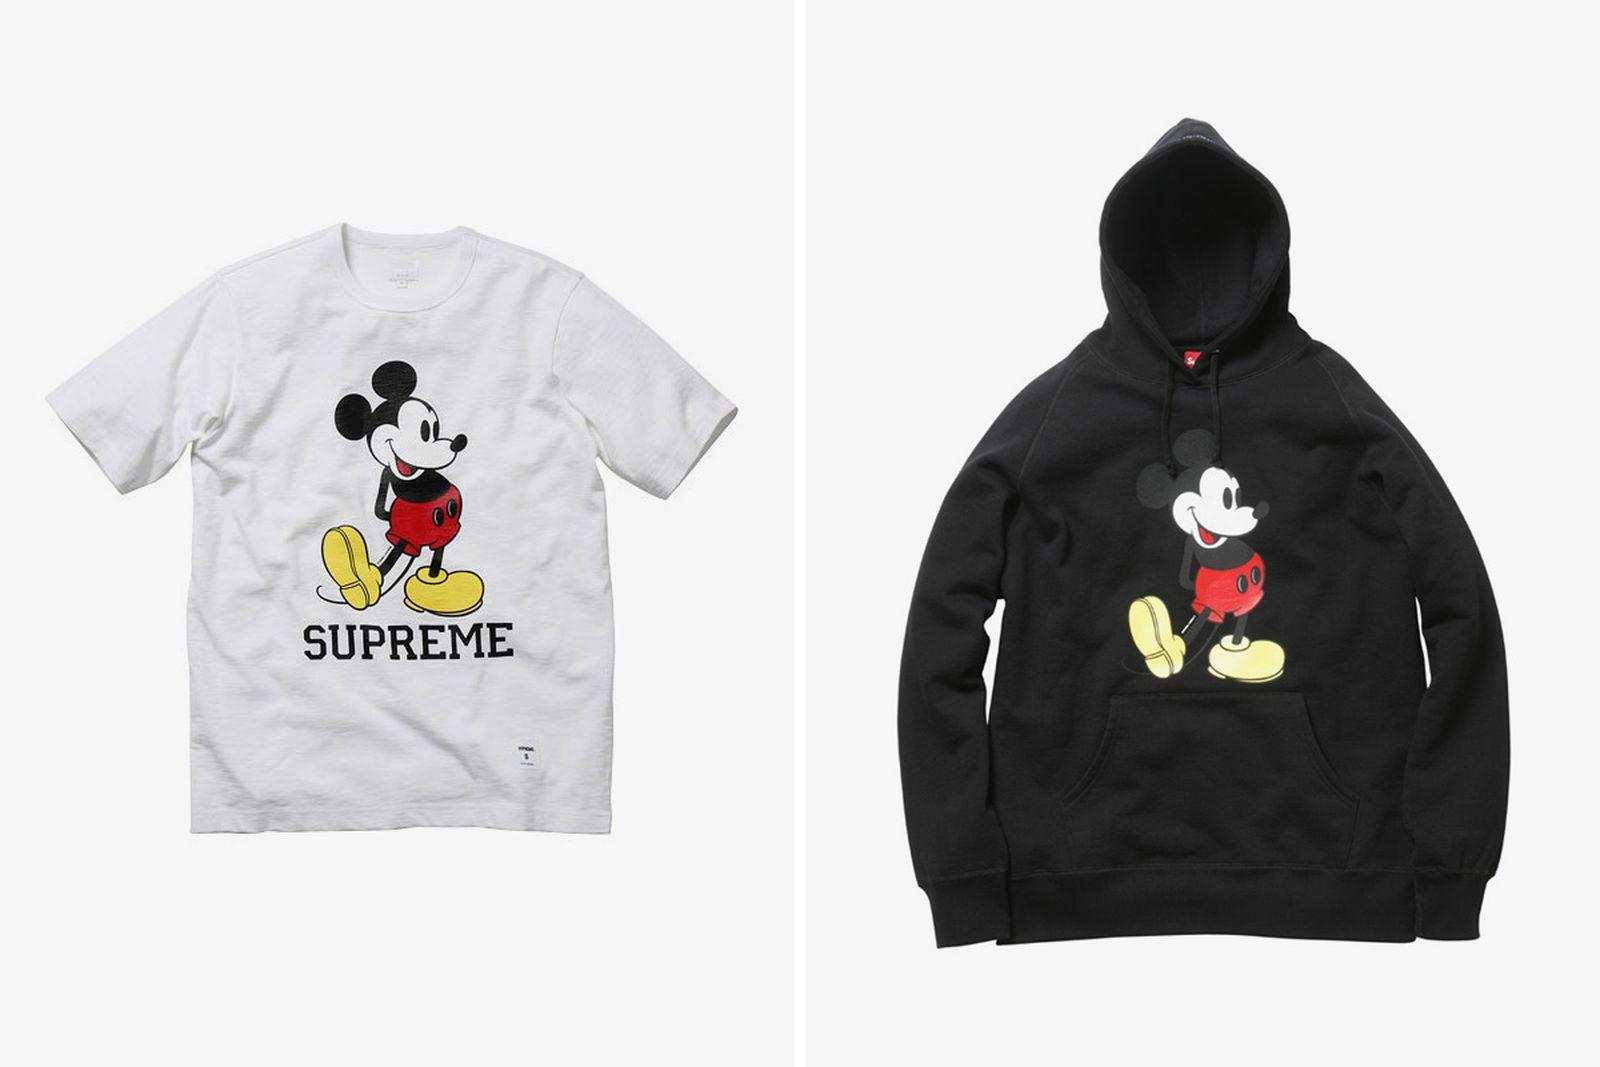 Disney-x-Supreme